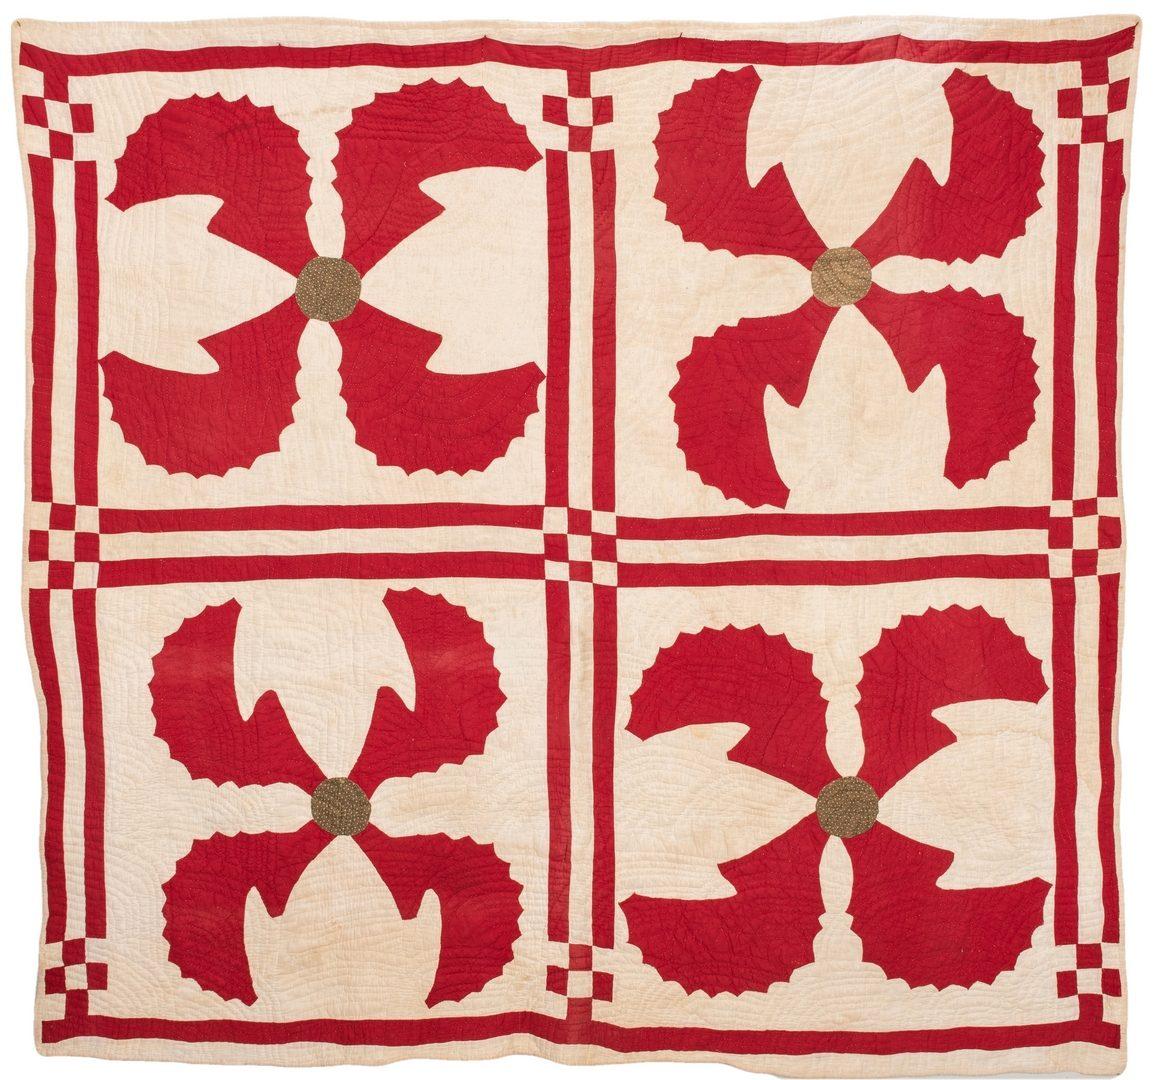 Lot 598: Pieced and Appliqued 4 Quadrant Quilt